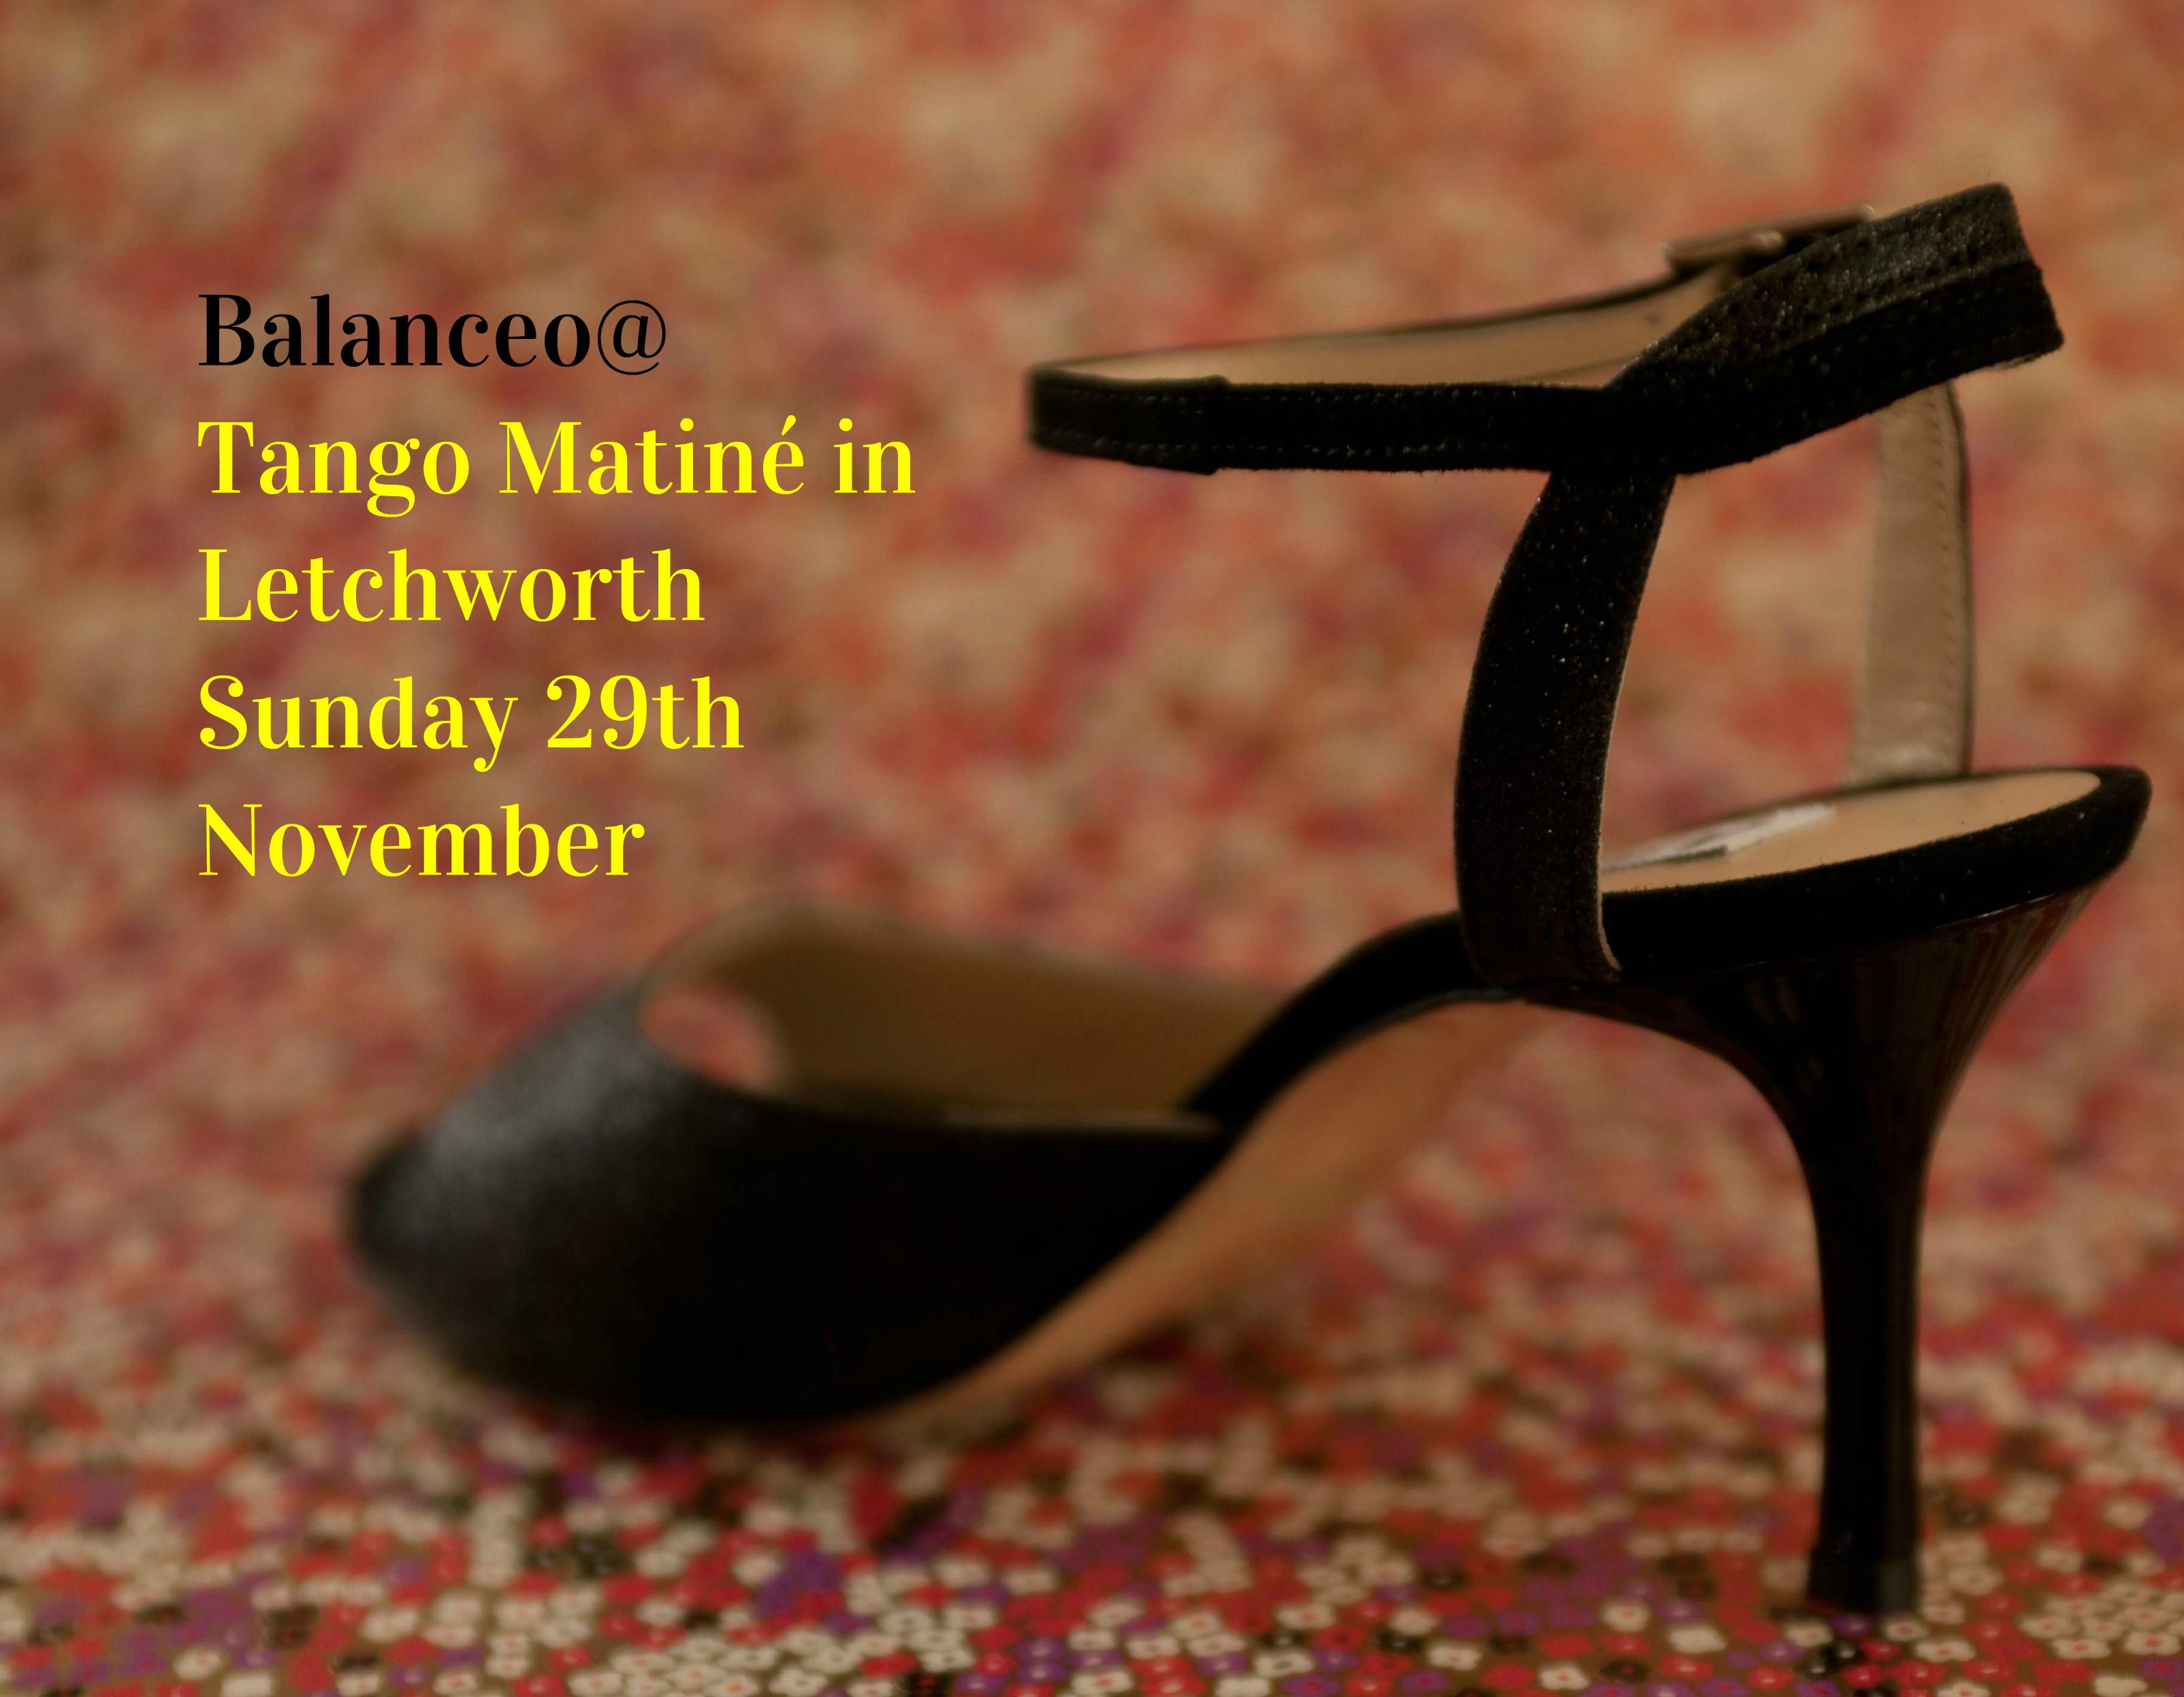 Balanceo @Tango Matiné in Letchworth